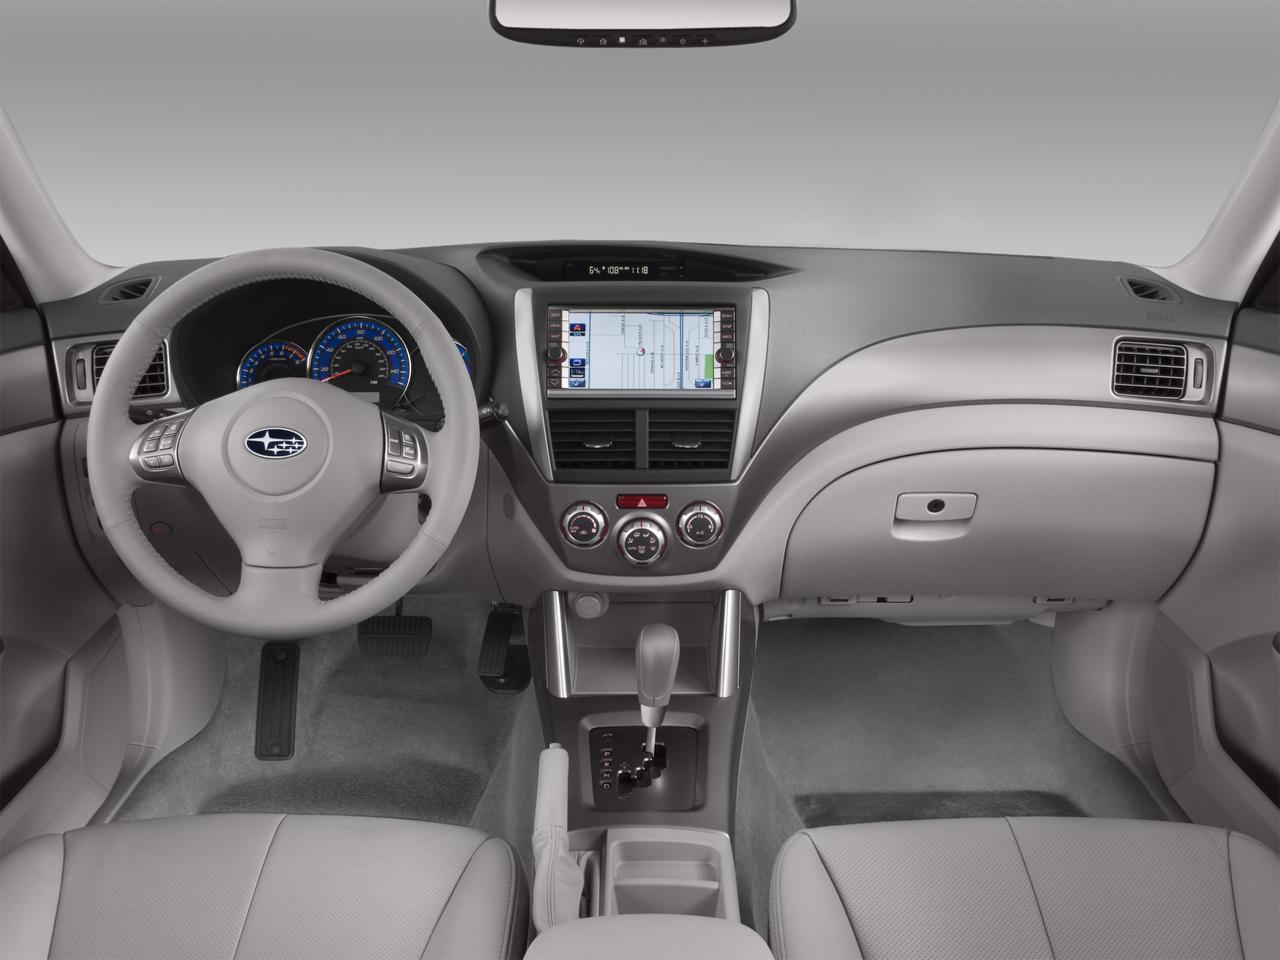 2009 Subaru Forester Sema Show Vehicle Automobile Magazine Electrical Wiring Diagrams 2003 Subara Outback Ll Bean 37 53